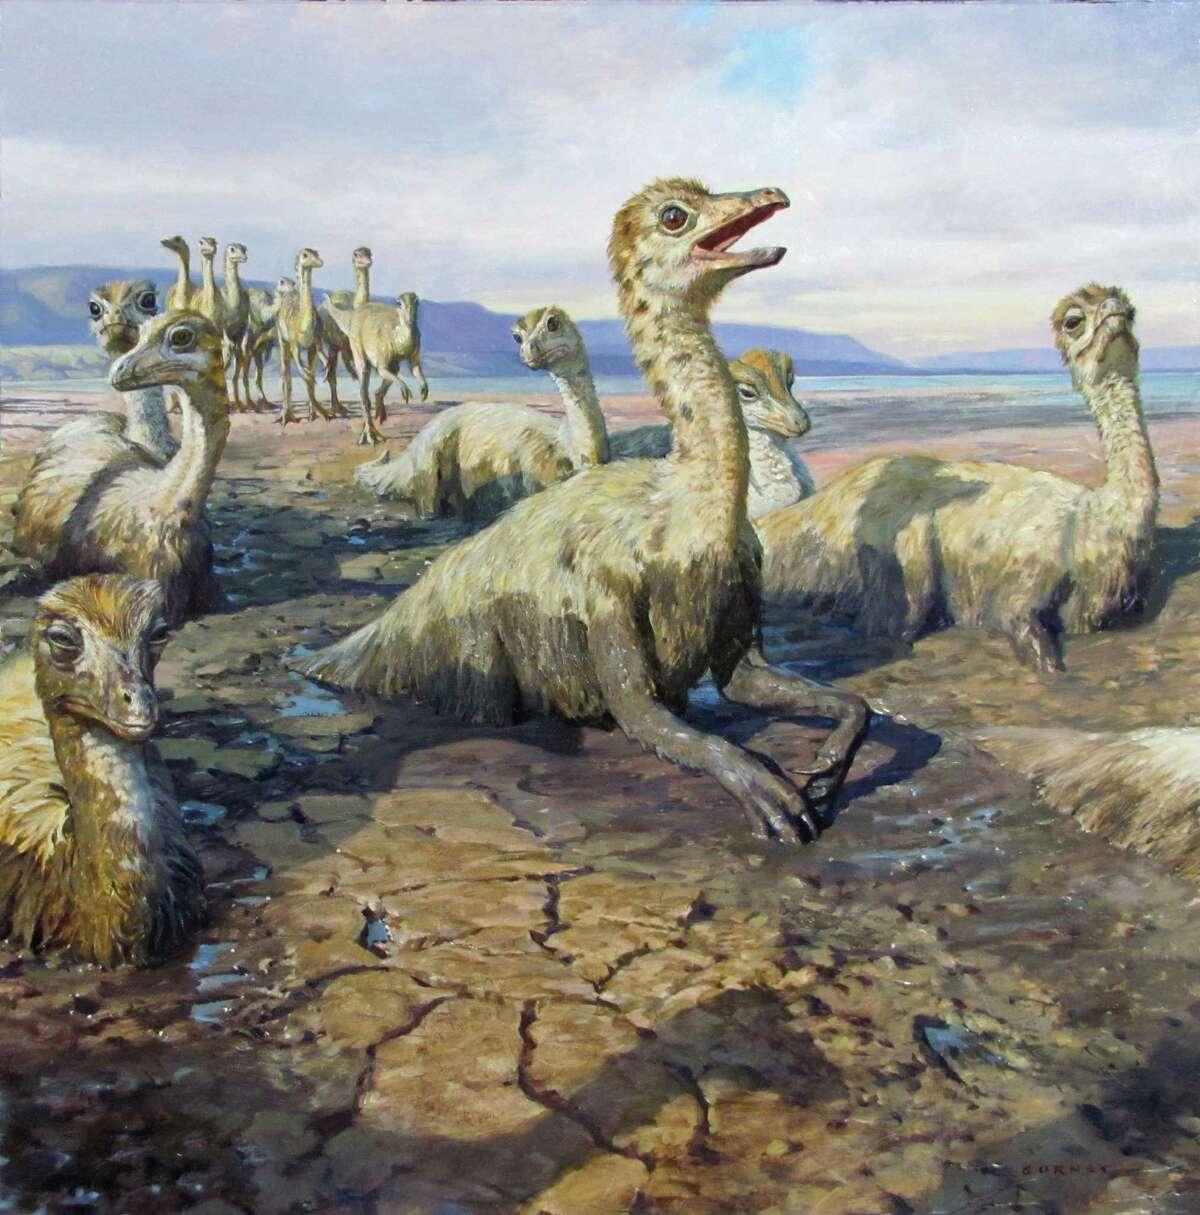 JAMES GURNEY Rhinebeck, New York, USA Sinornithomimus dongi Oil on illustration board, 2011 18 x 18 in (45.7 x 45.7 cm) (Courtesy State Museum)